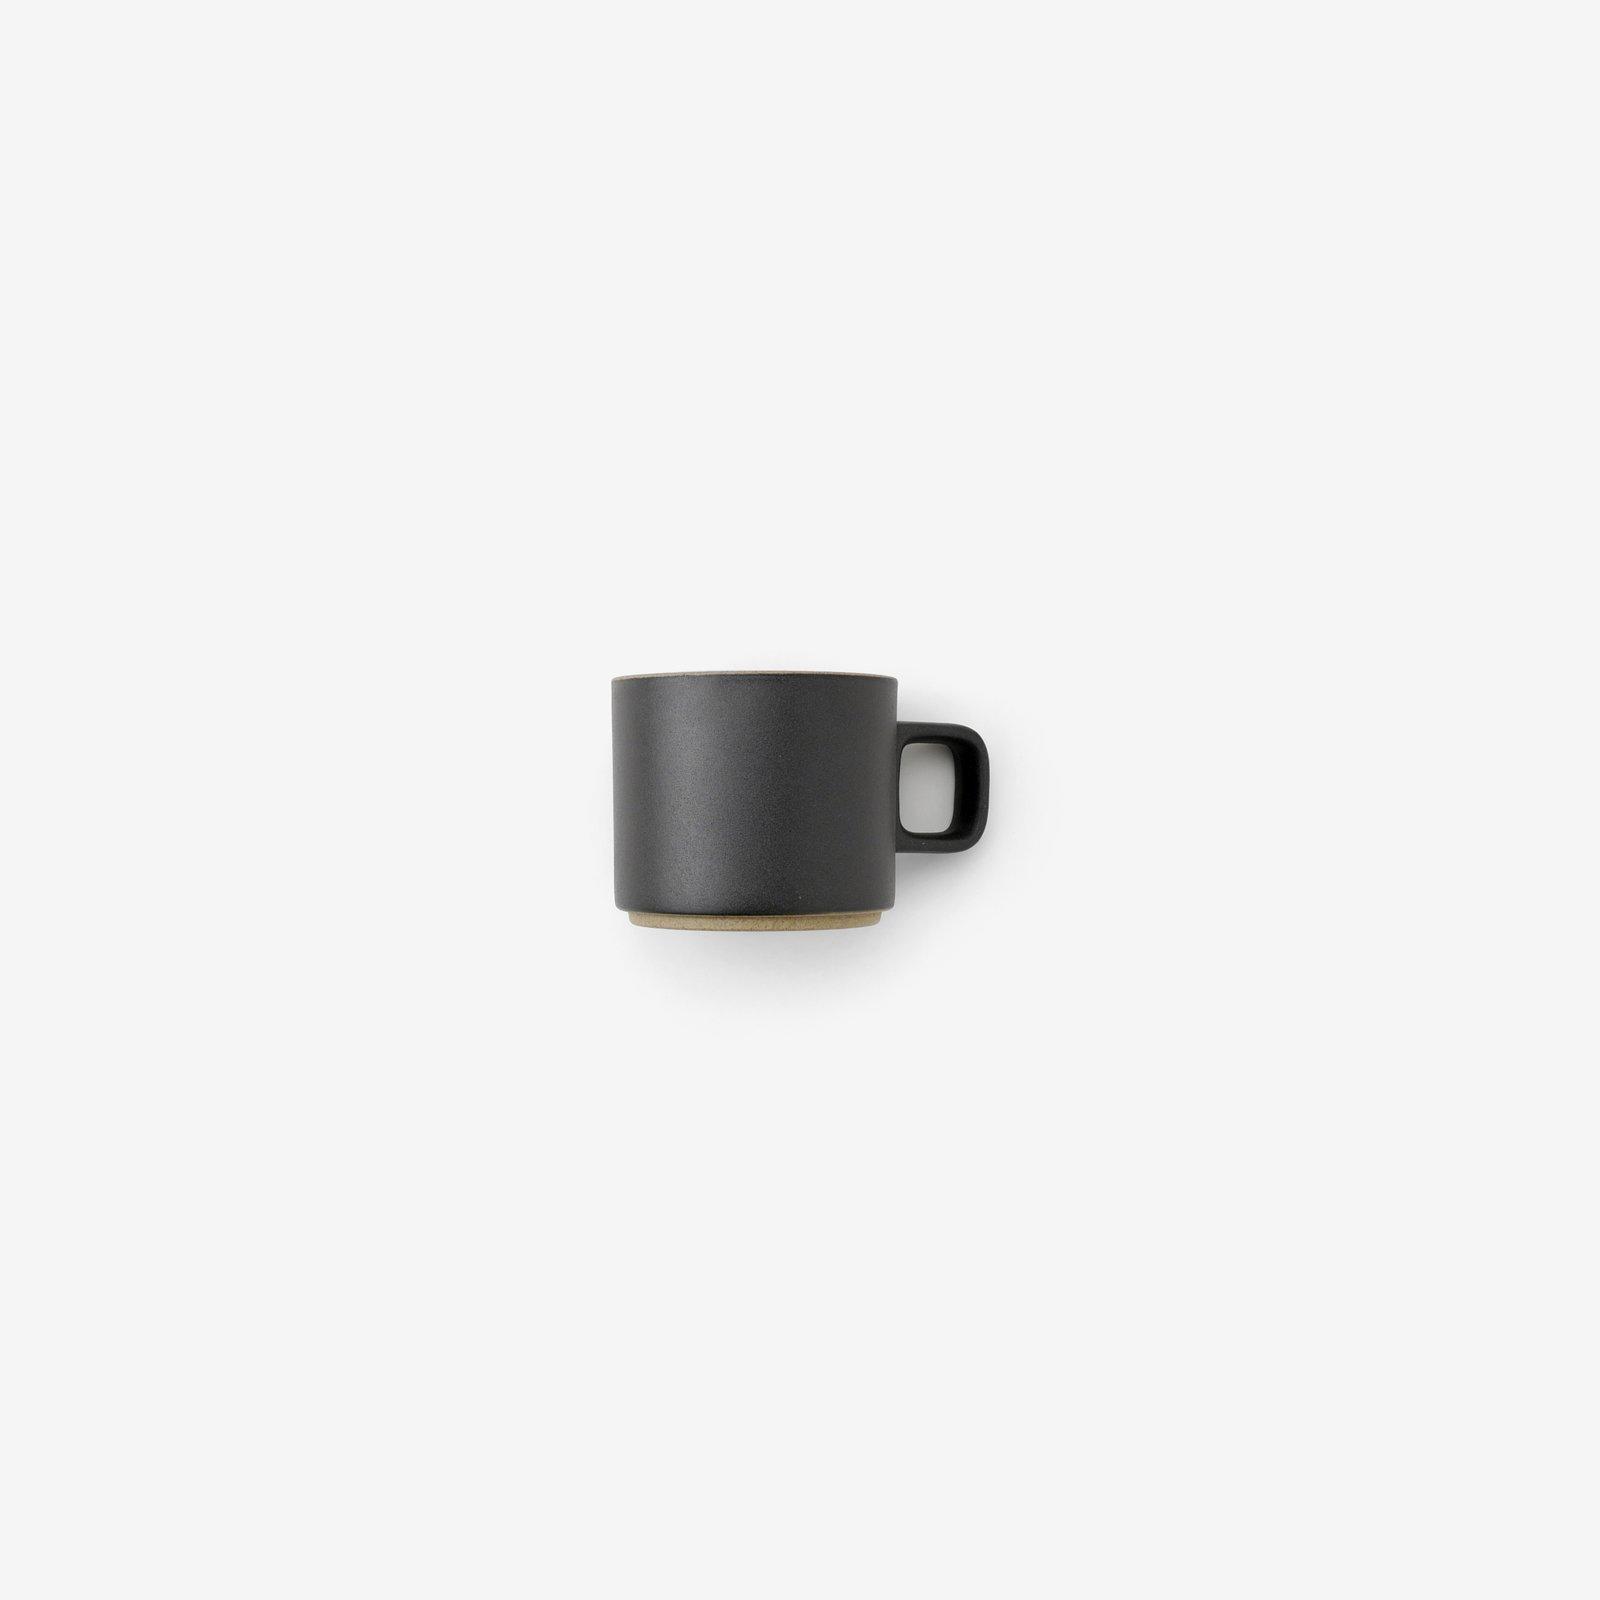 Photo 1 of 1 in Hasami Porcelain Mug - Small